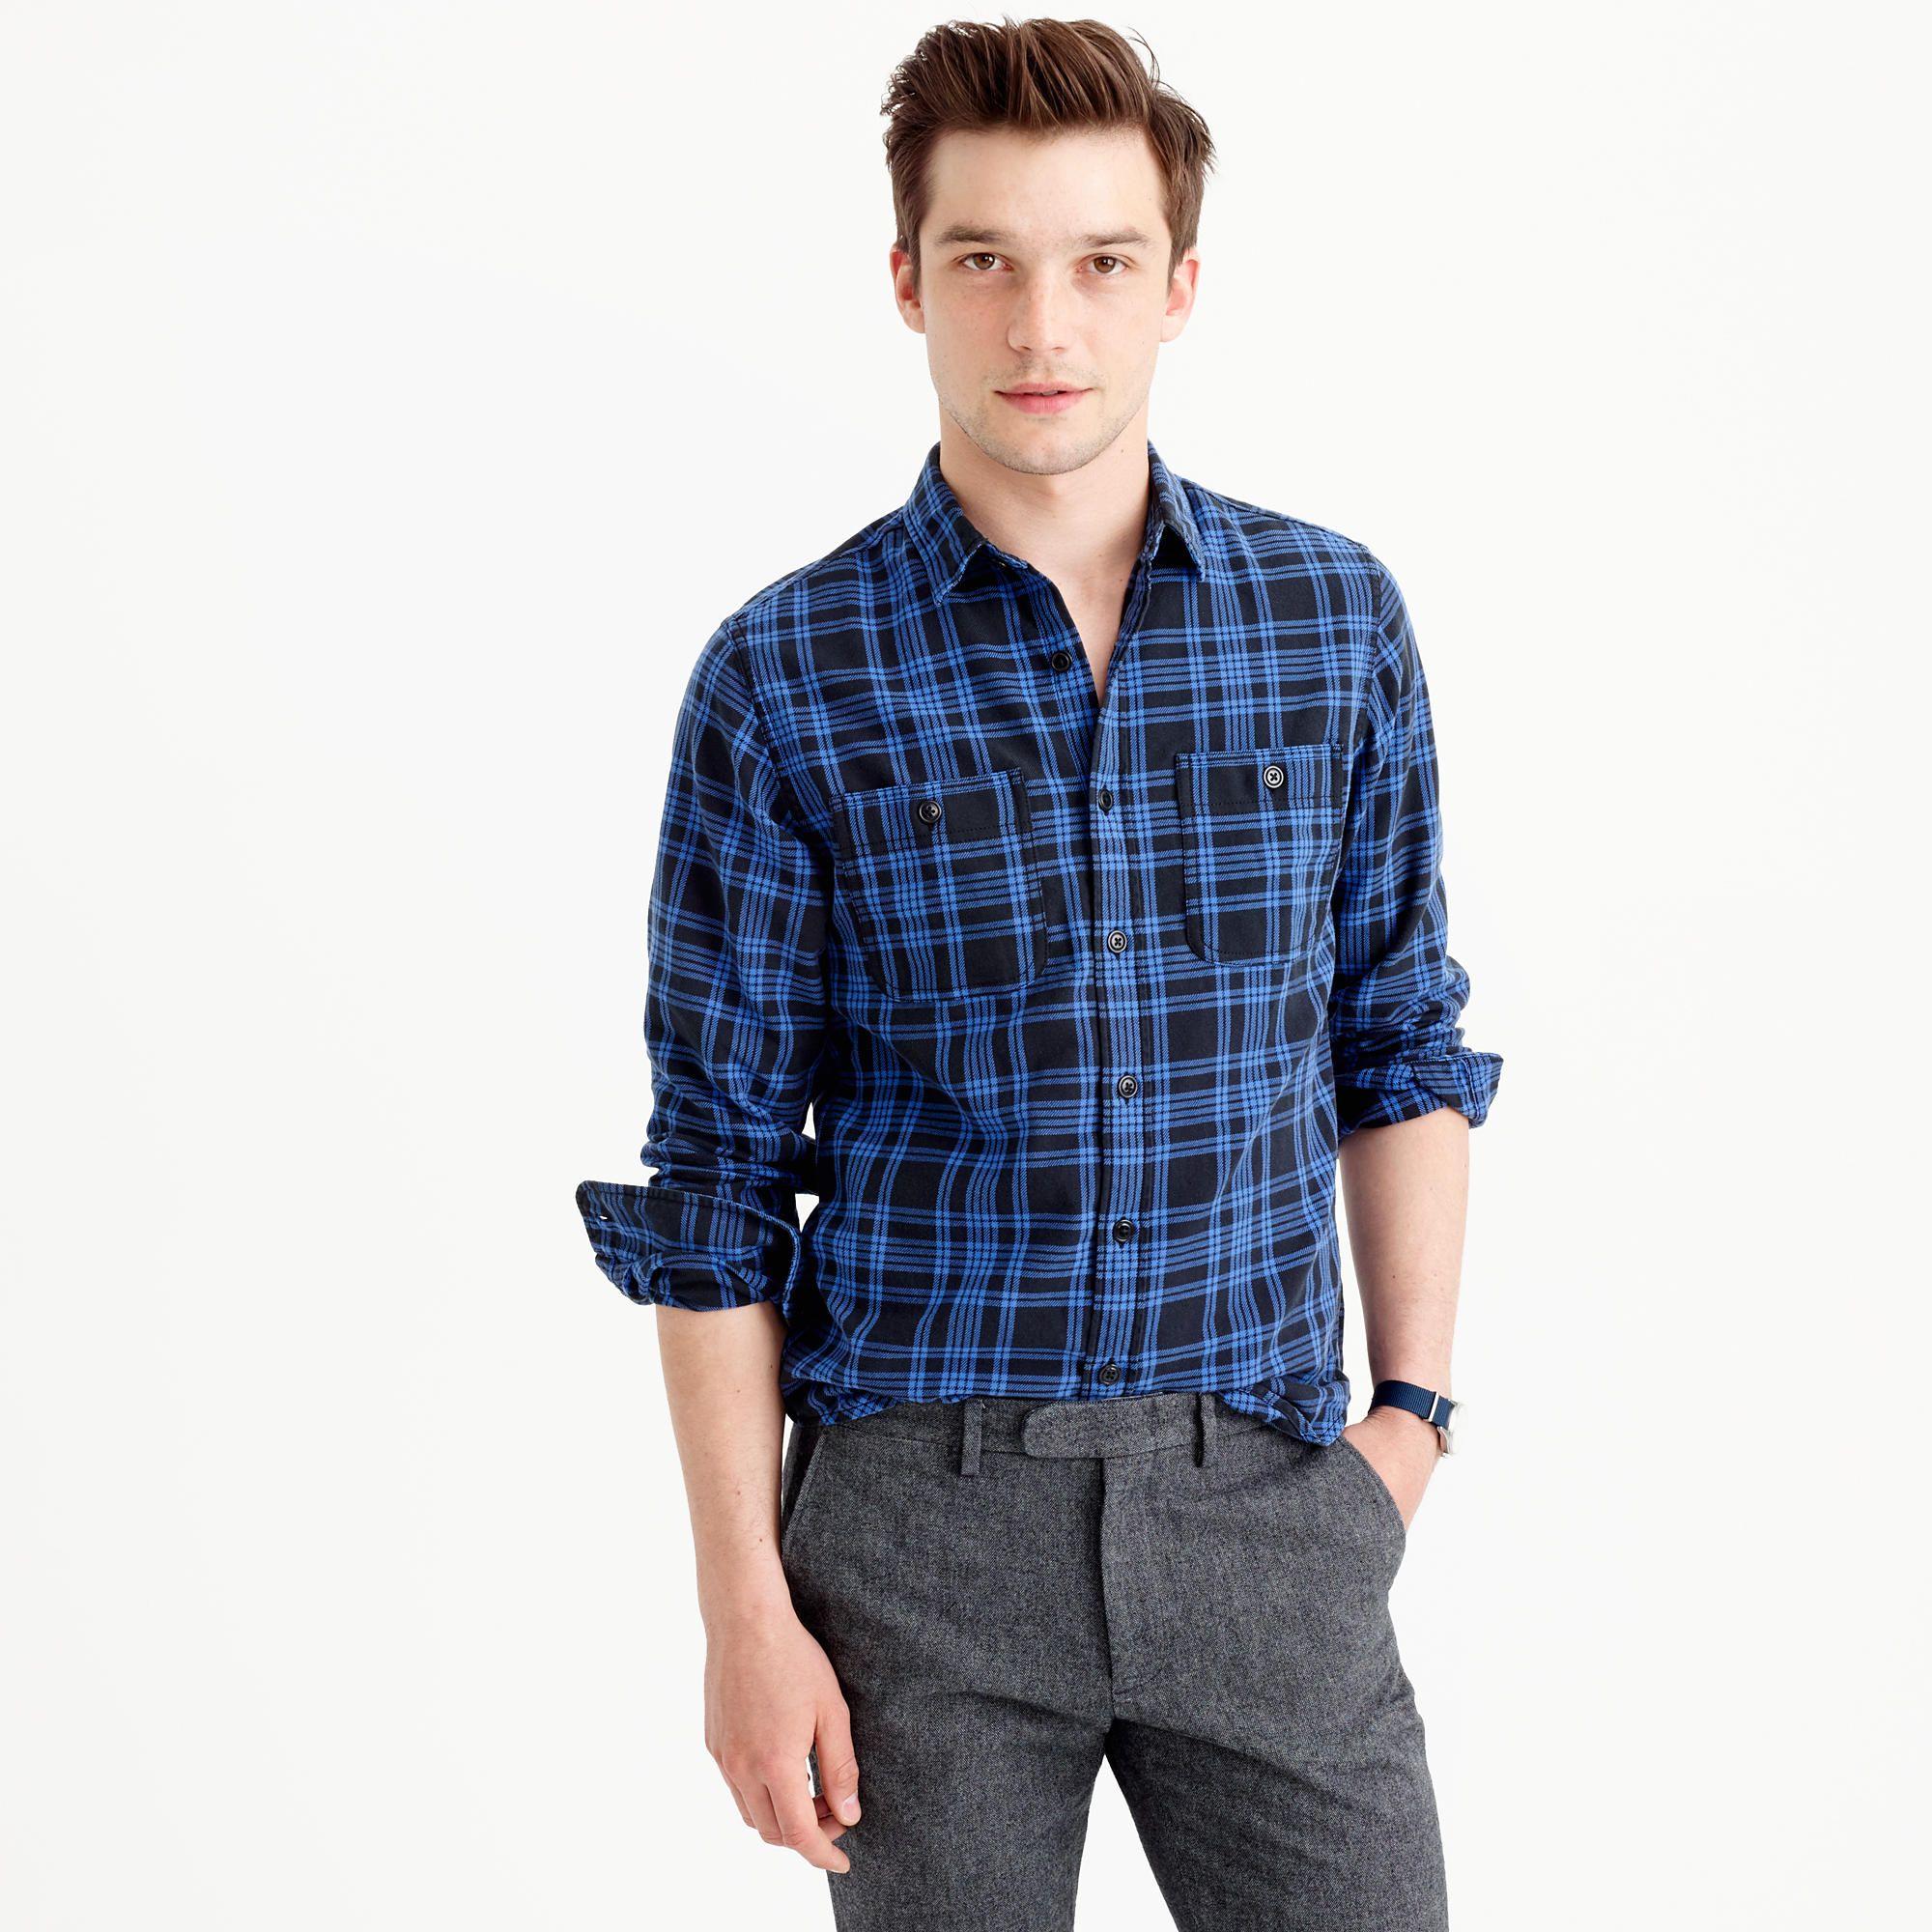 Flannel shirt jeans  Pin by Hayun Jeon on WARDROBE  Pinterest  Wardrobes